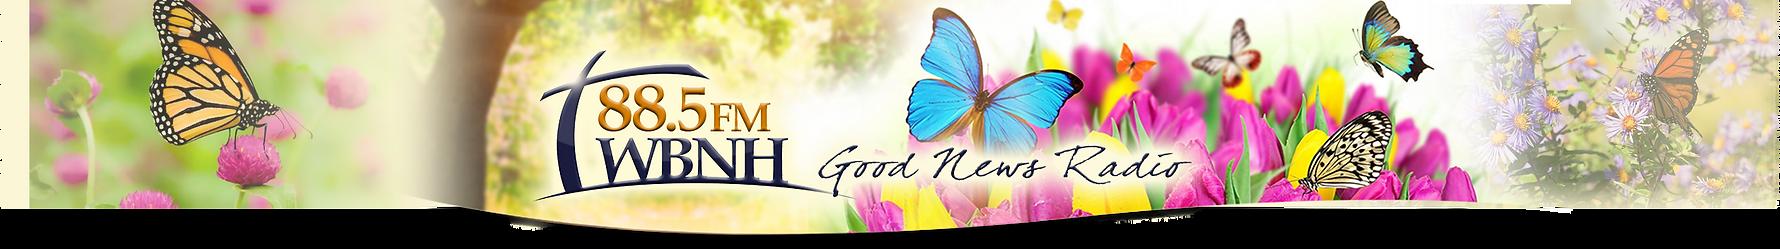 Header-WBNH-Master-spring.png